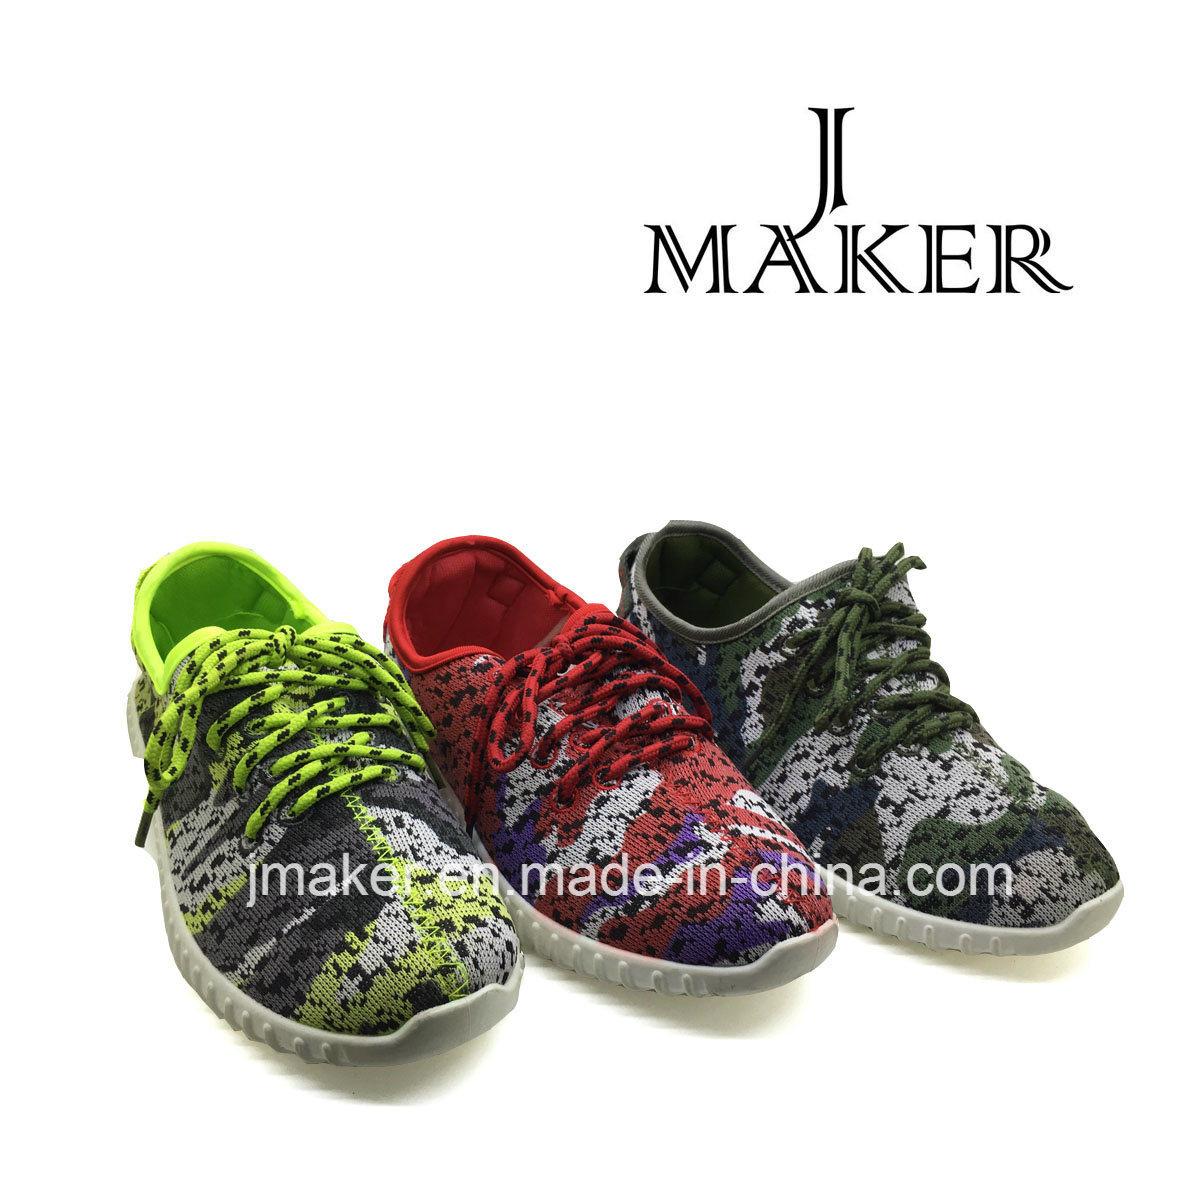 2016 Latest Fashion Sport Running Shoe Jm2064